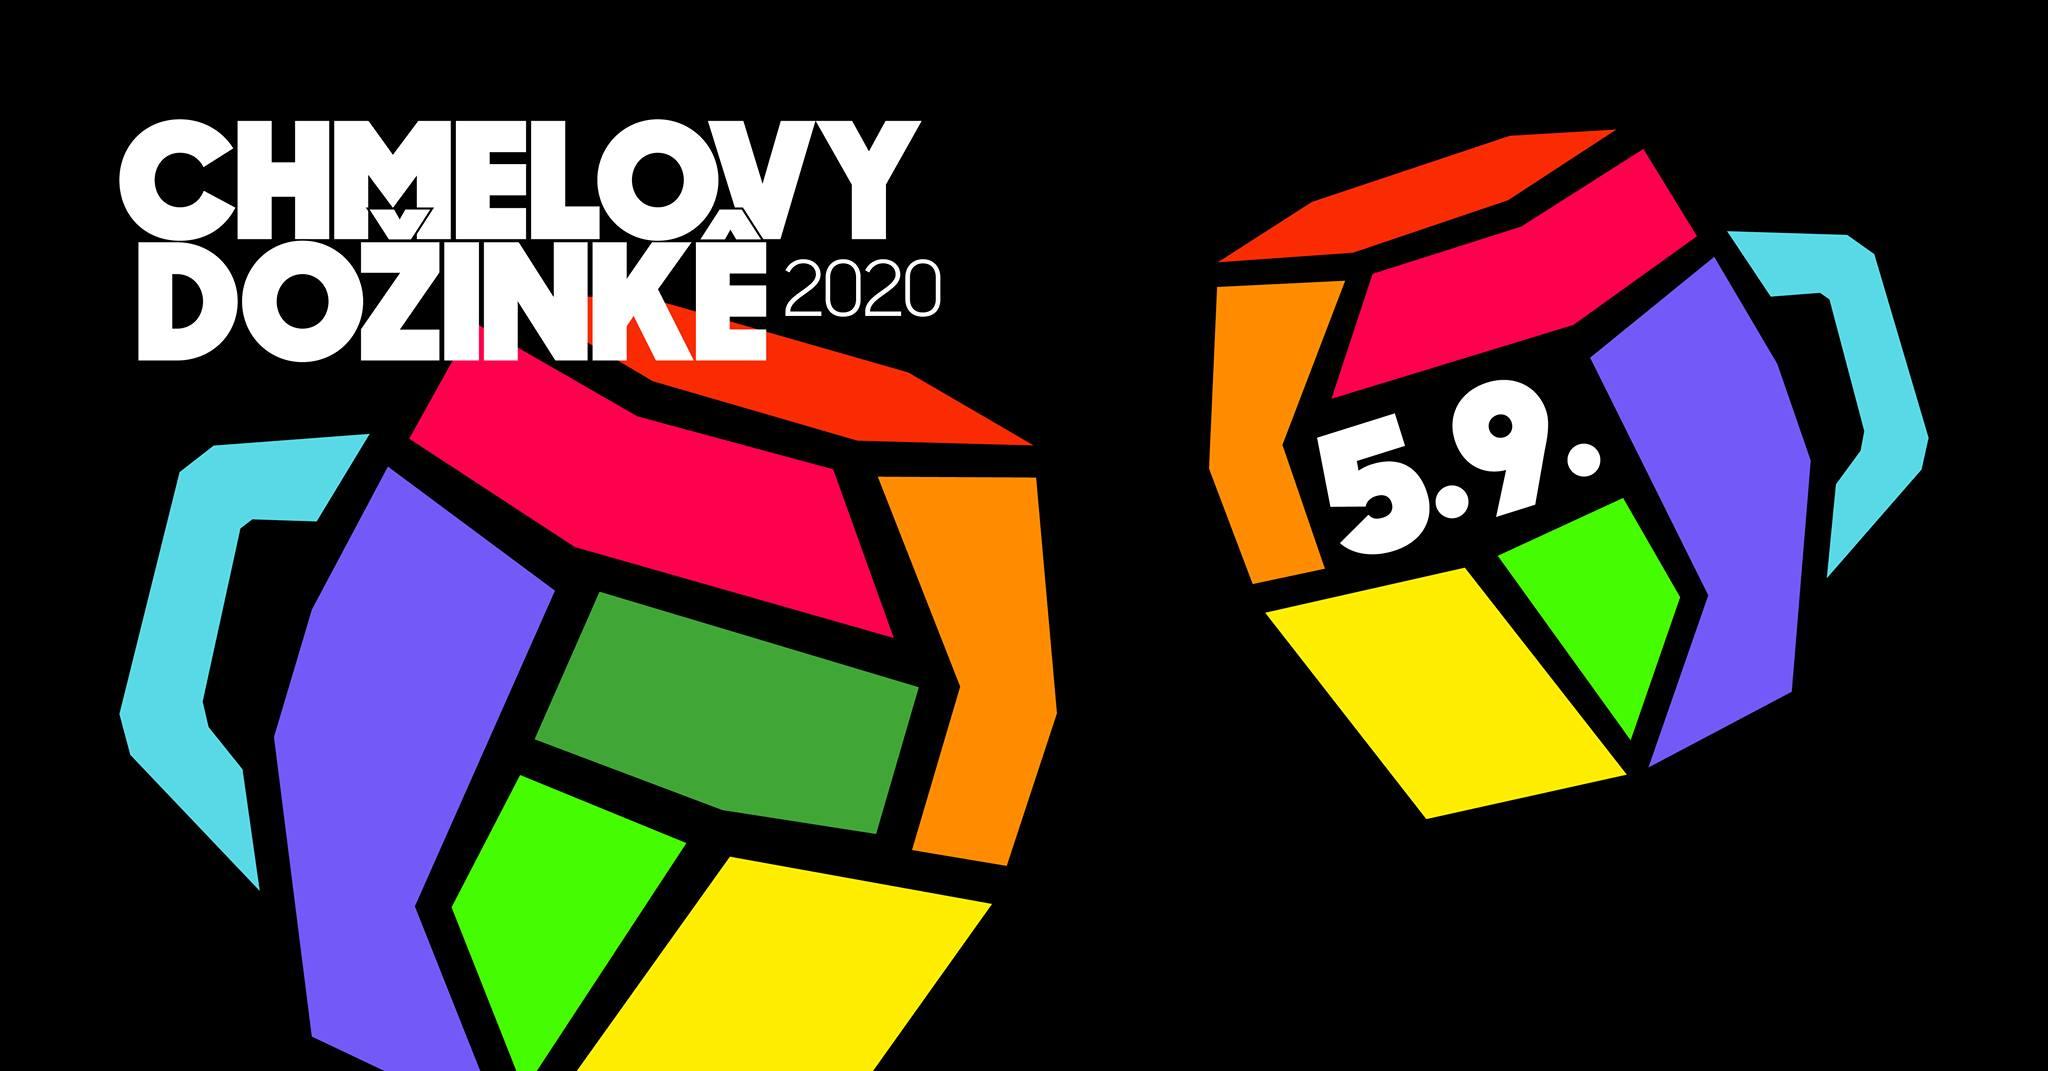 pivovari-pivovary-pivni-akce-chmelovy-dozinke-olomouc-2020